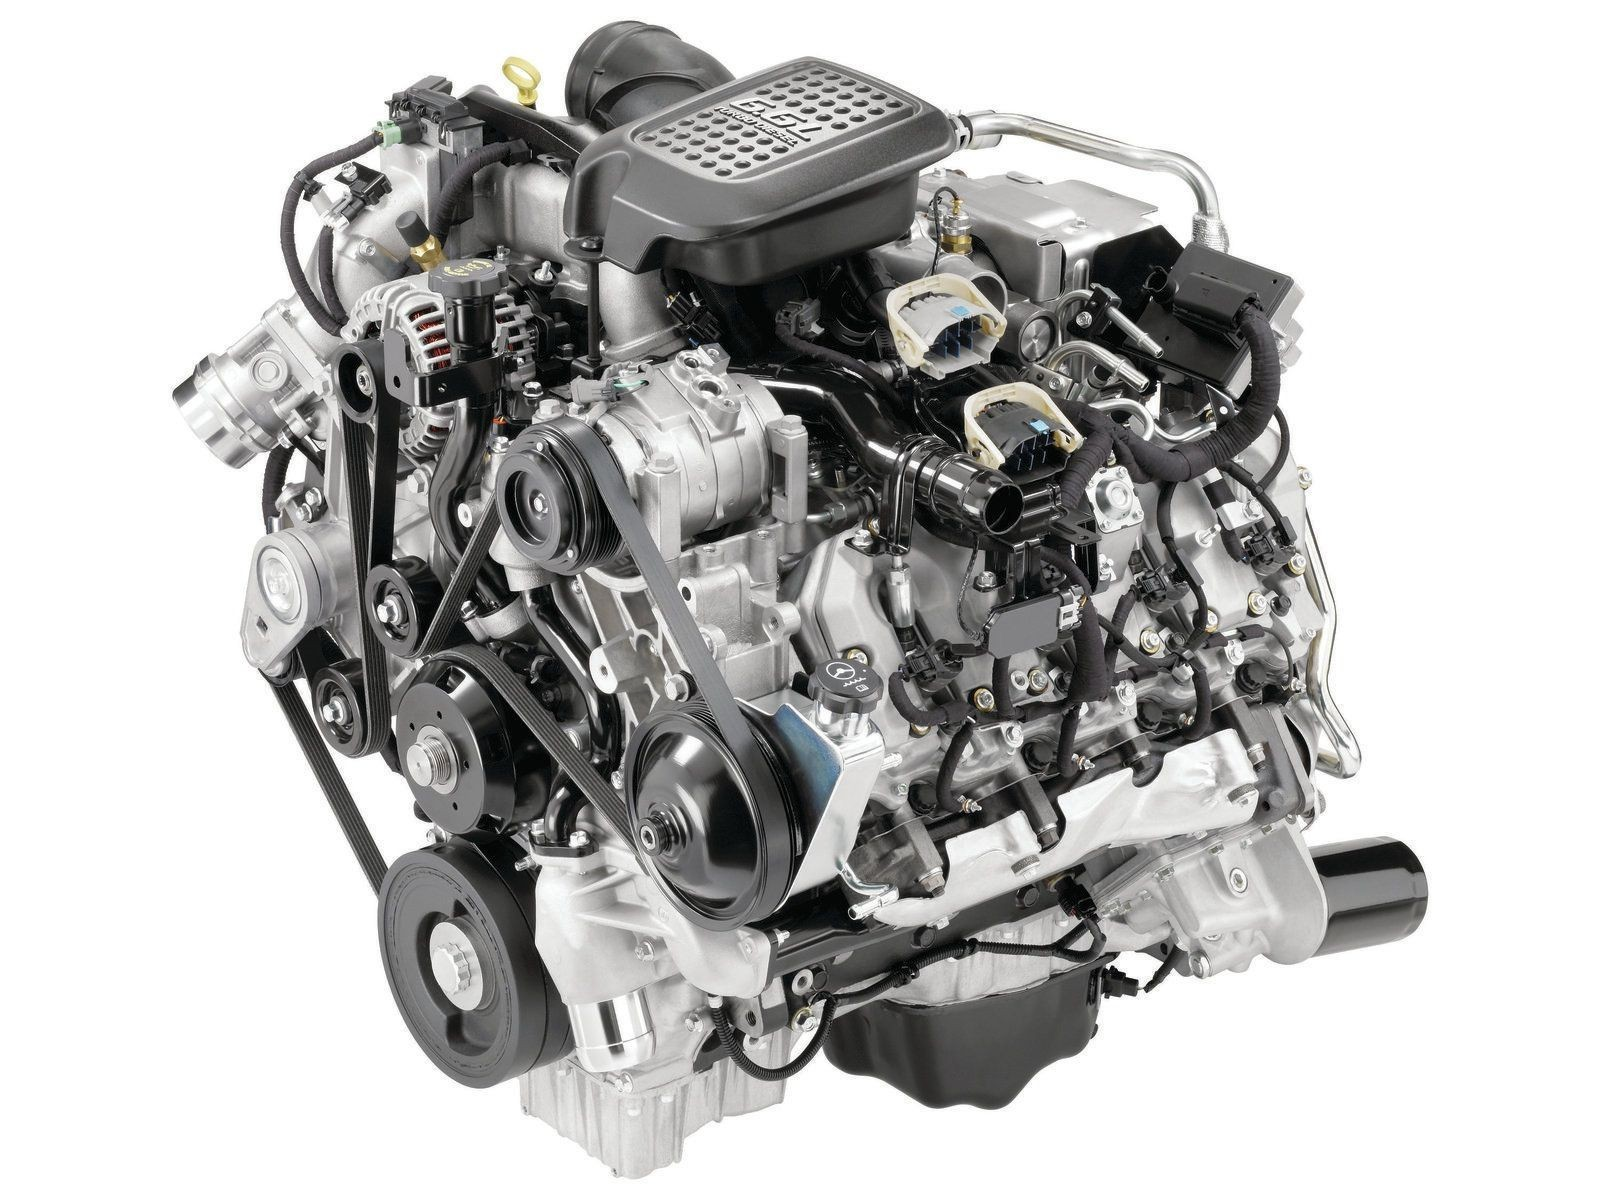 Lb7 Duramax Engine Diagram Lb7 Glow Plug Relay Wiring Diagram New Duramax Diesel Engine Diagram Of Lb7 Duramax Engine Diagram